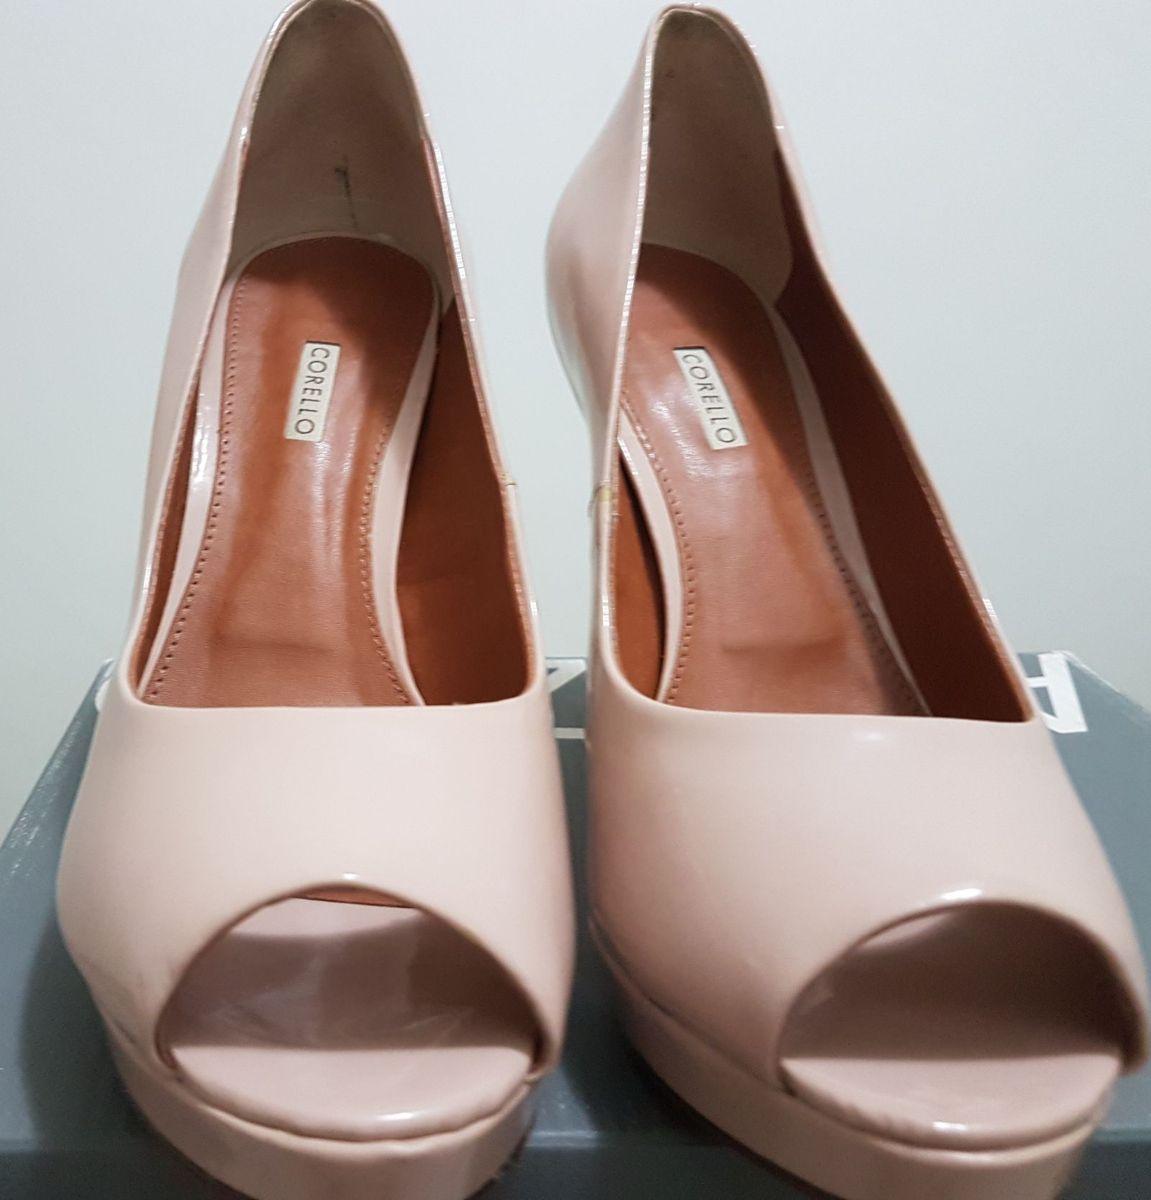 9c5b02d17 sapato nude corello - sapatos corello.  Czm6ly9wag90b3muzw5qb2vplmnvbs5ici9wcm9kdwn0cy84nja2mduylzuwztmzyzhlyzhknjuzzdq2mmm2mthlmwewzdblmgu0lmpwzw